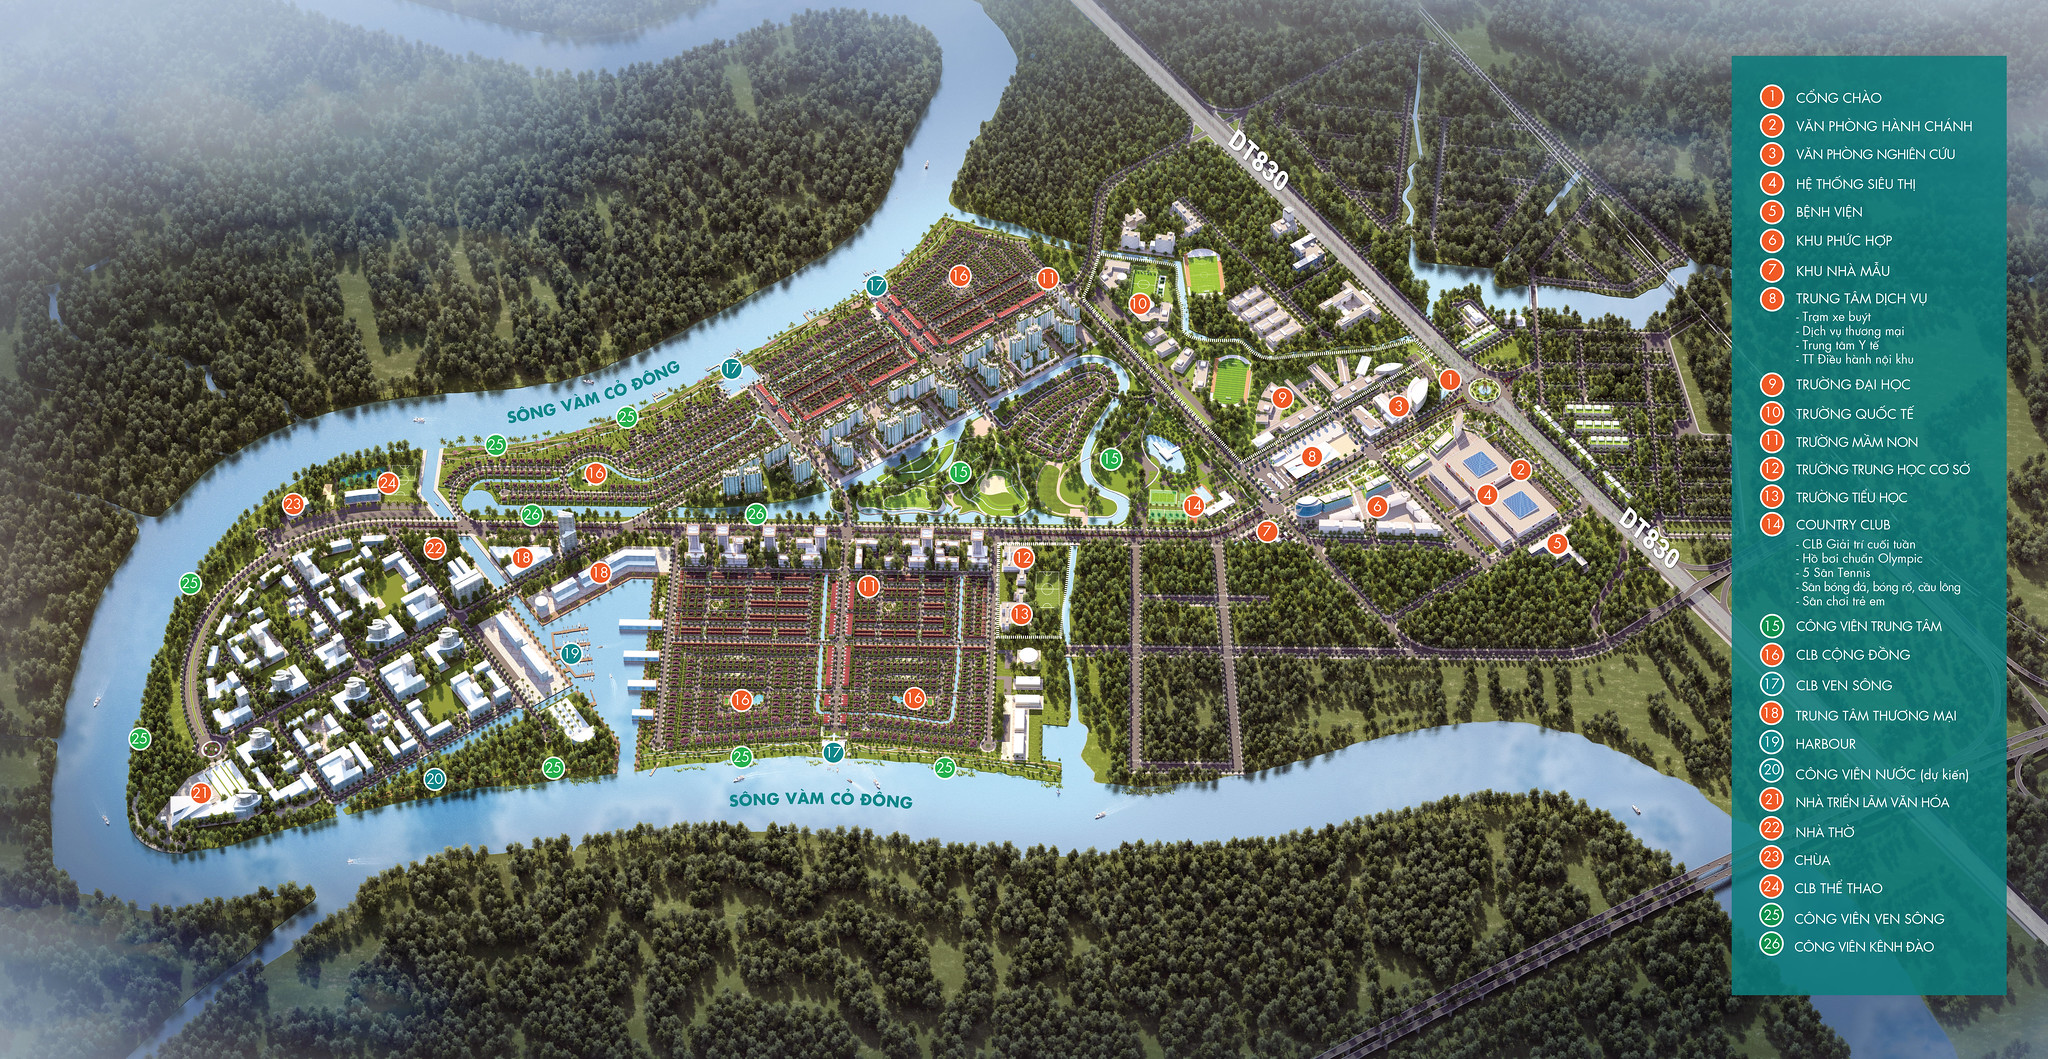 Master Plan Layout mặt bằng tiện ích chi tiết WaterPoint Nam Long